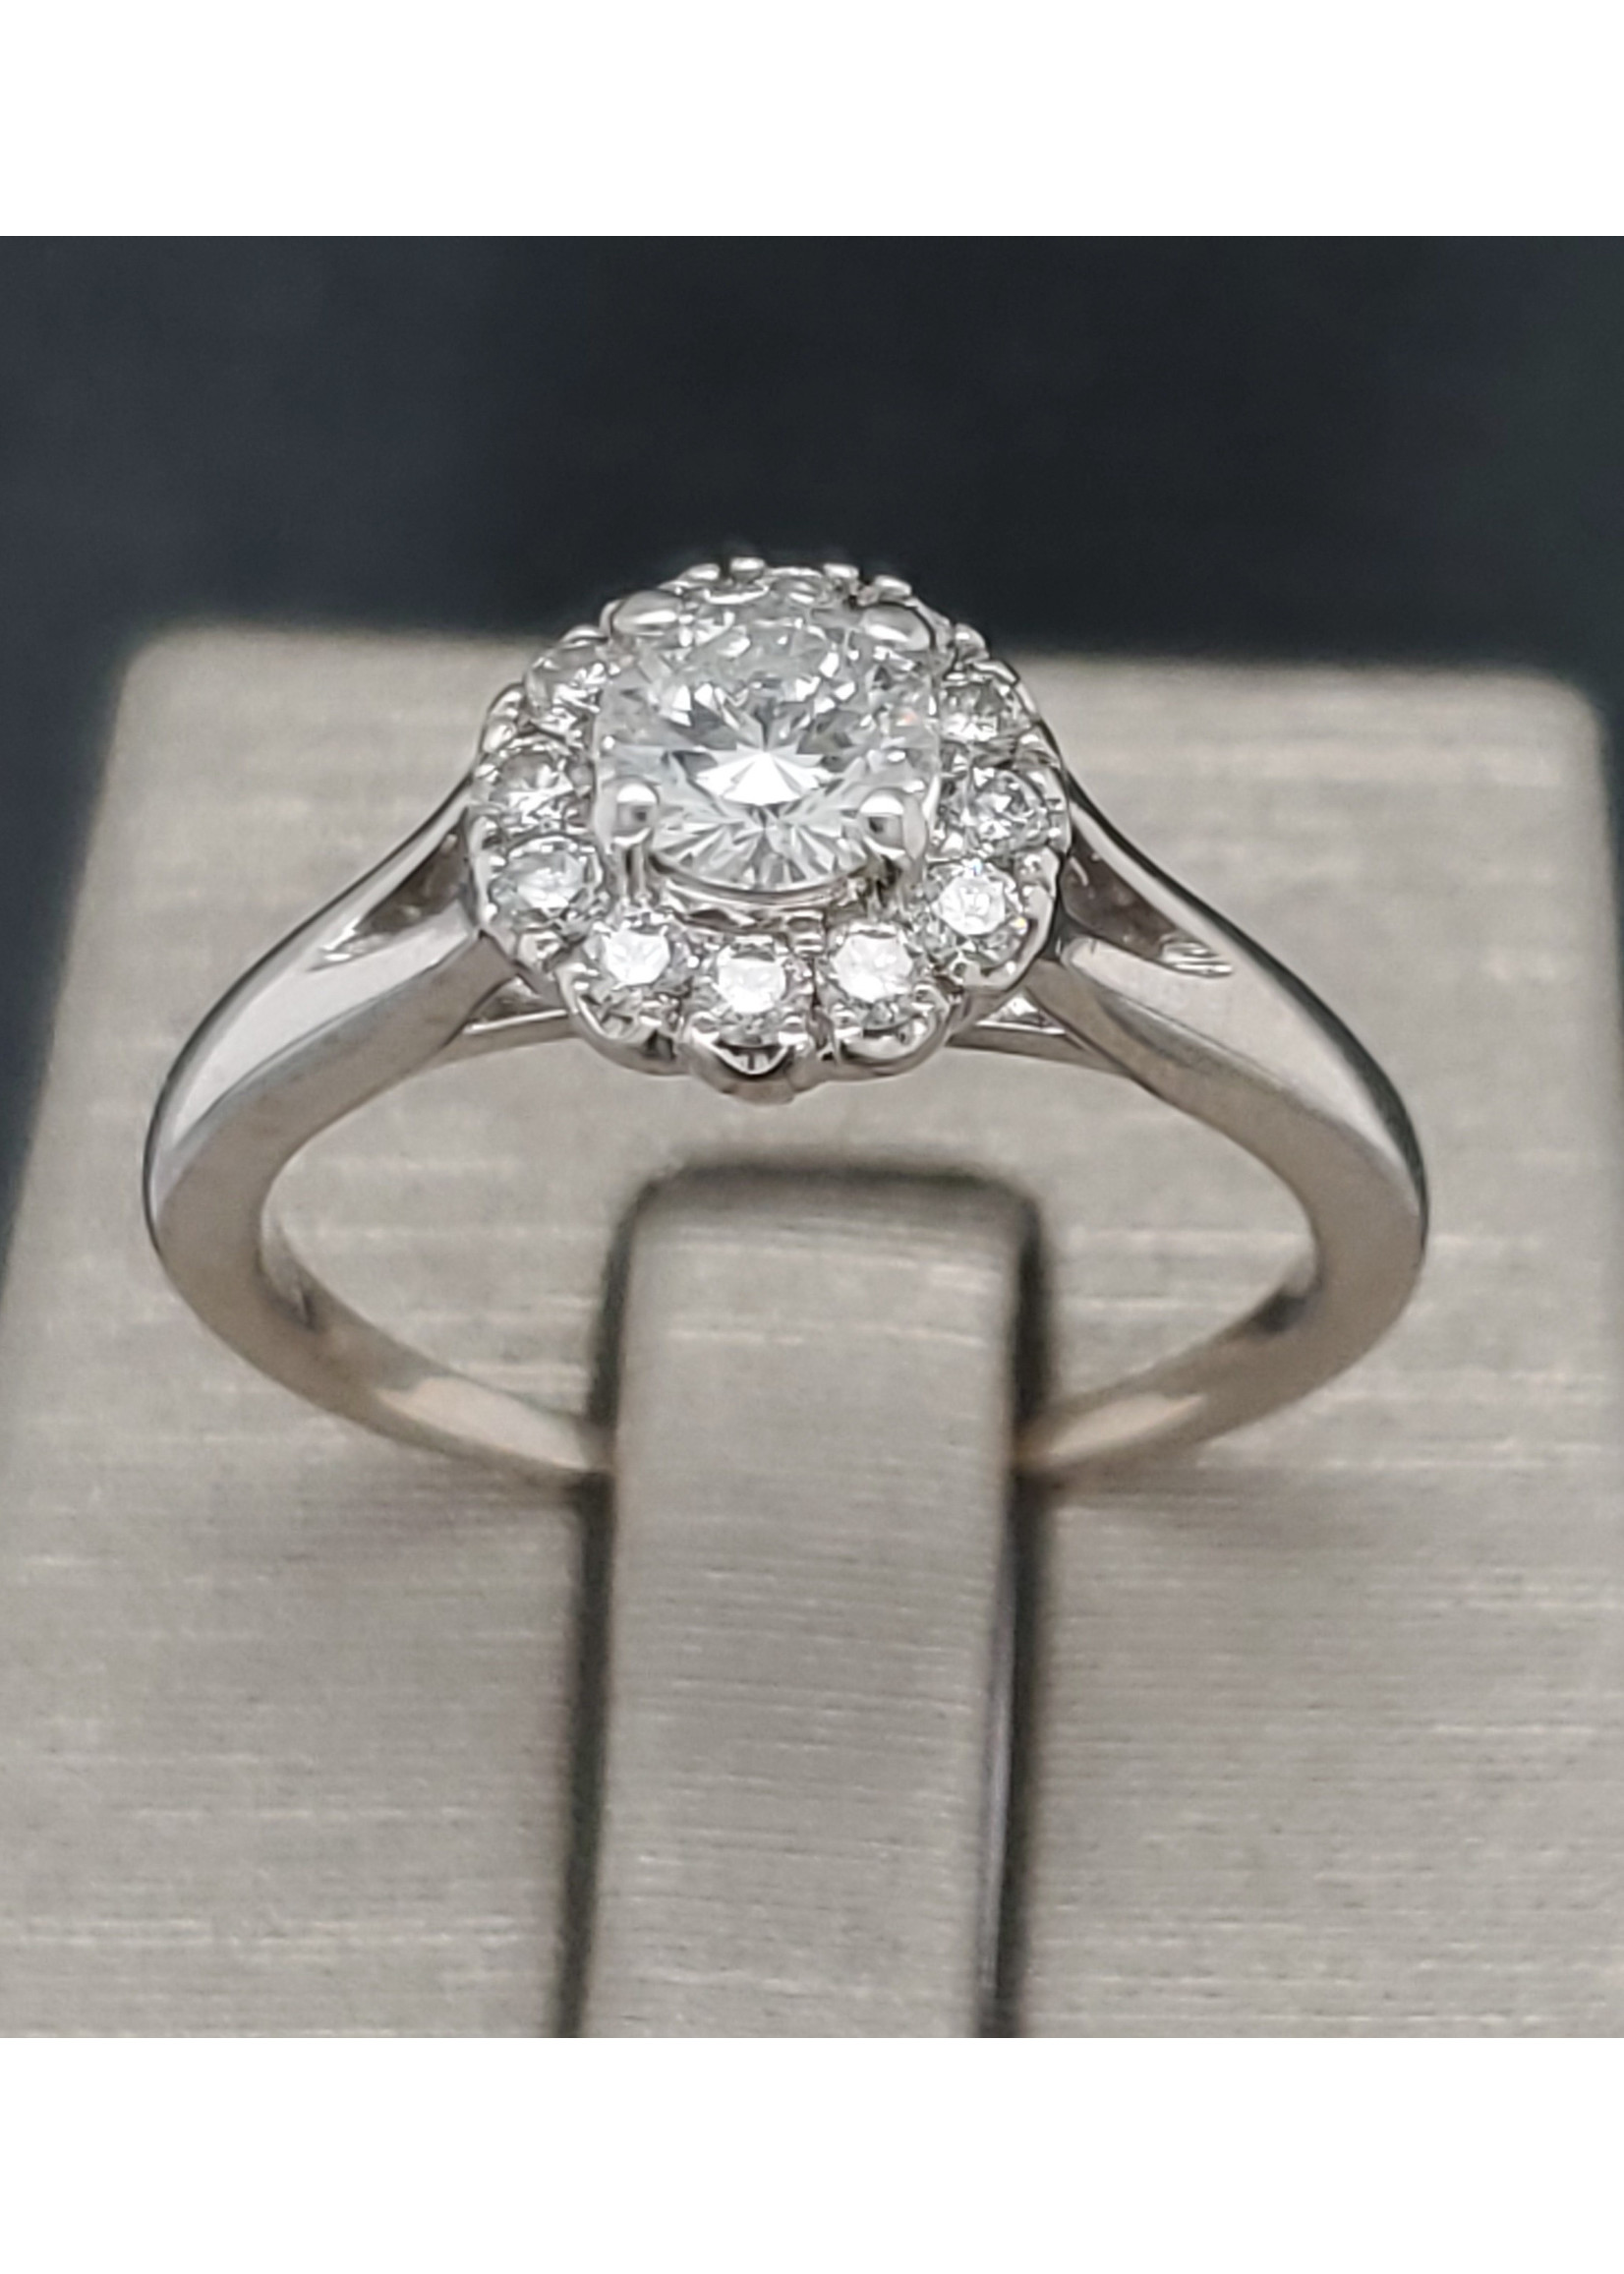 Vintage Jewellery Vintage 14k Halo Ring | Sz 7.25 1mm Band